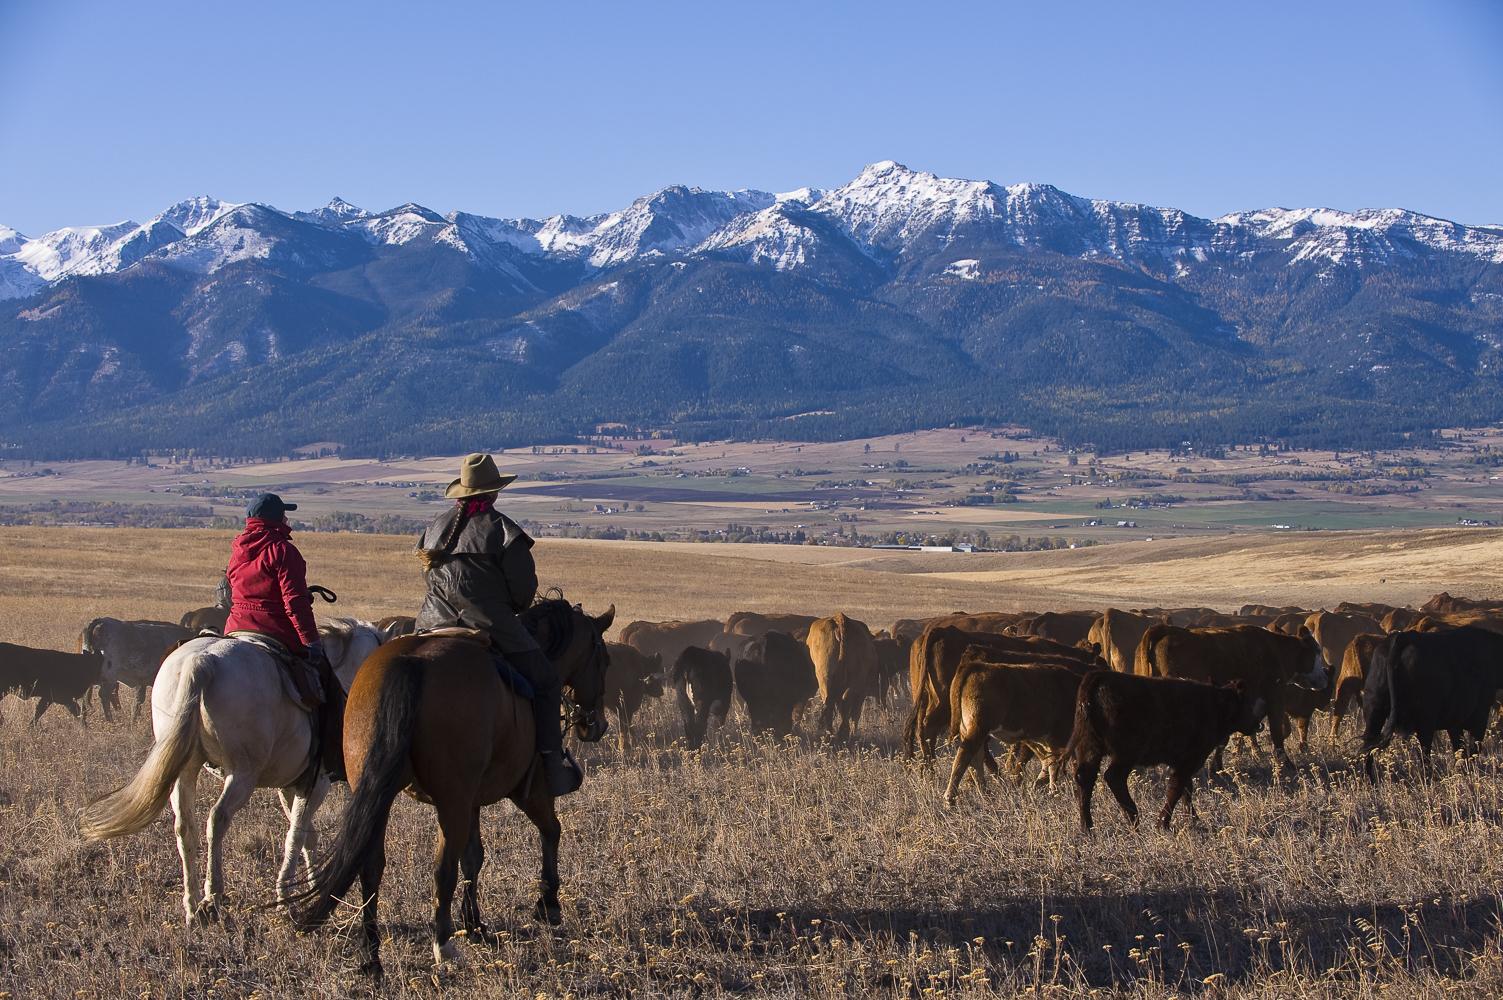 Tension as Catalyst: Land Stewardship